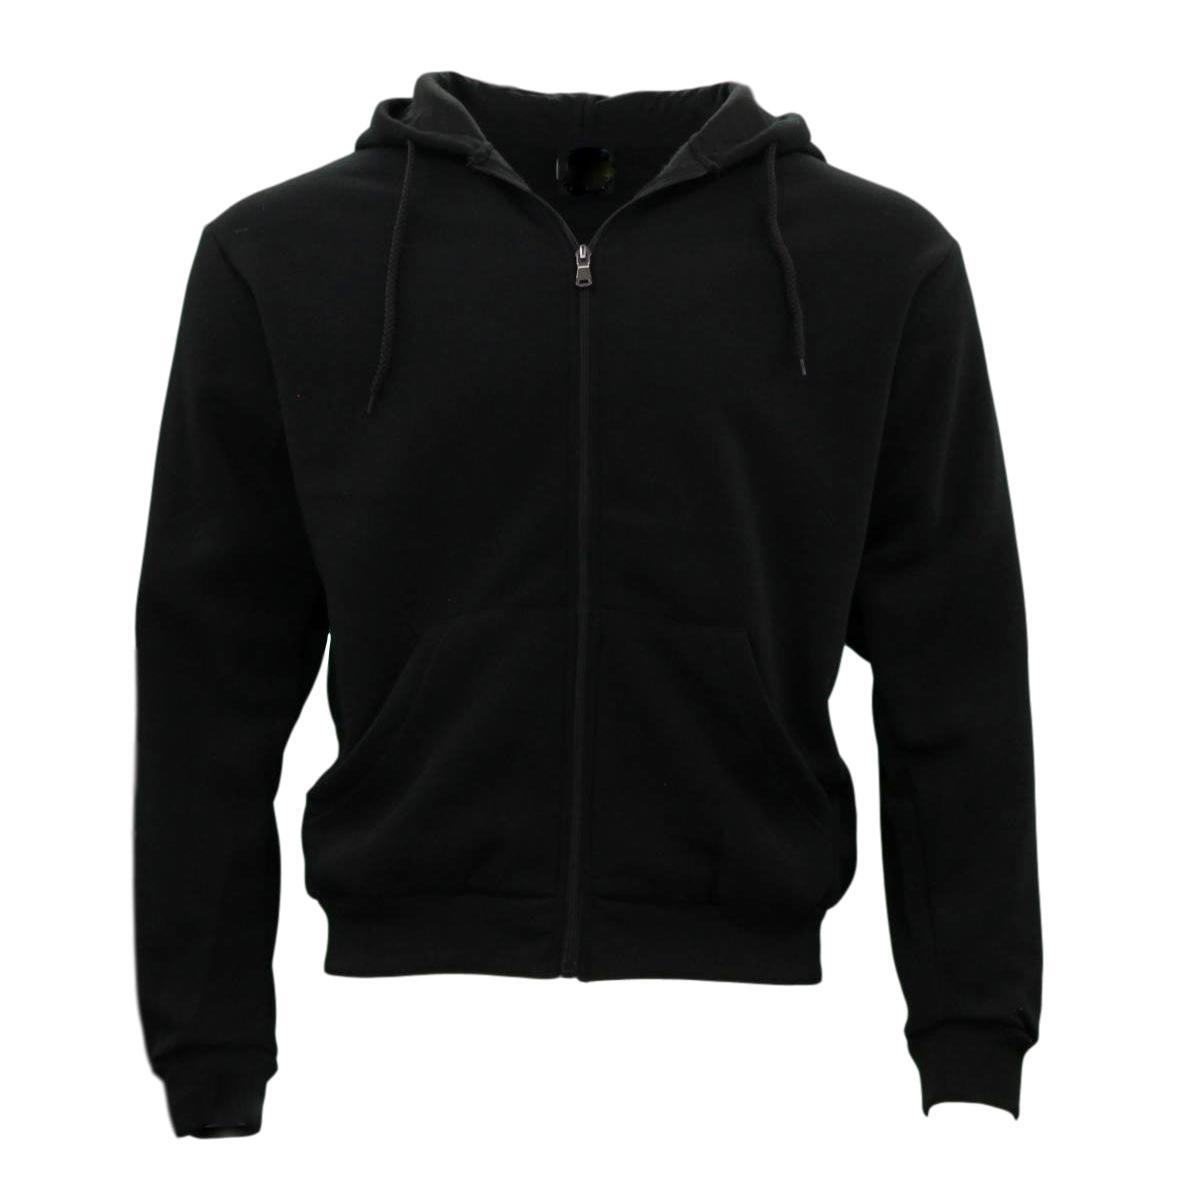 Adult Unisex Men's Zip Up Hoodie w Fleece Hooded Jacket Jumper Basic Blank Plain